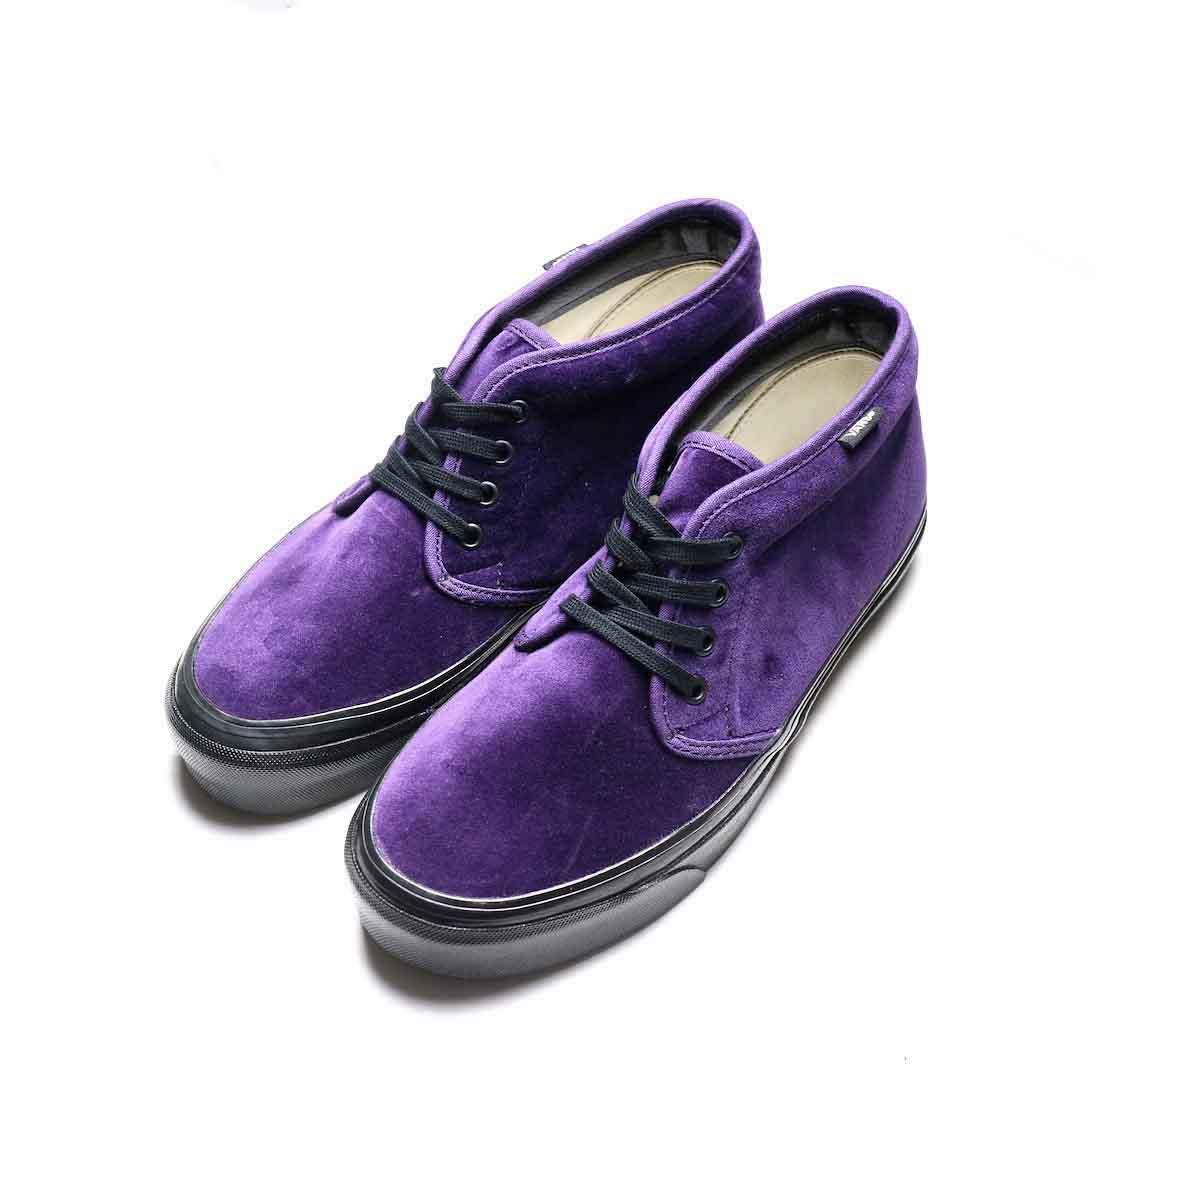 VANS / CHUKKA 49 DX (ANAHEIM FACTORY) (Purple VELVET)